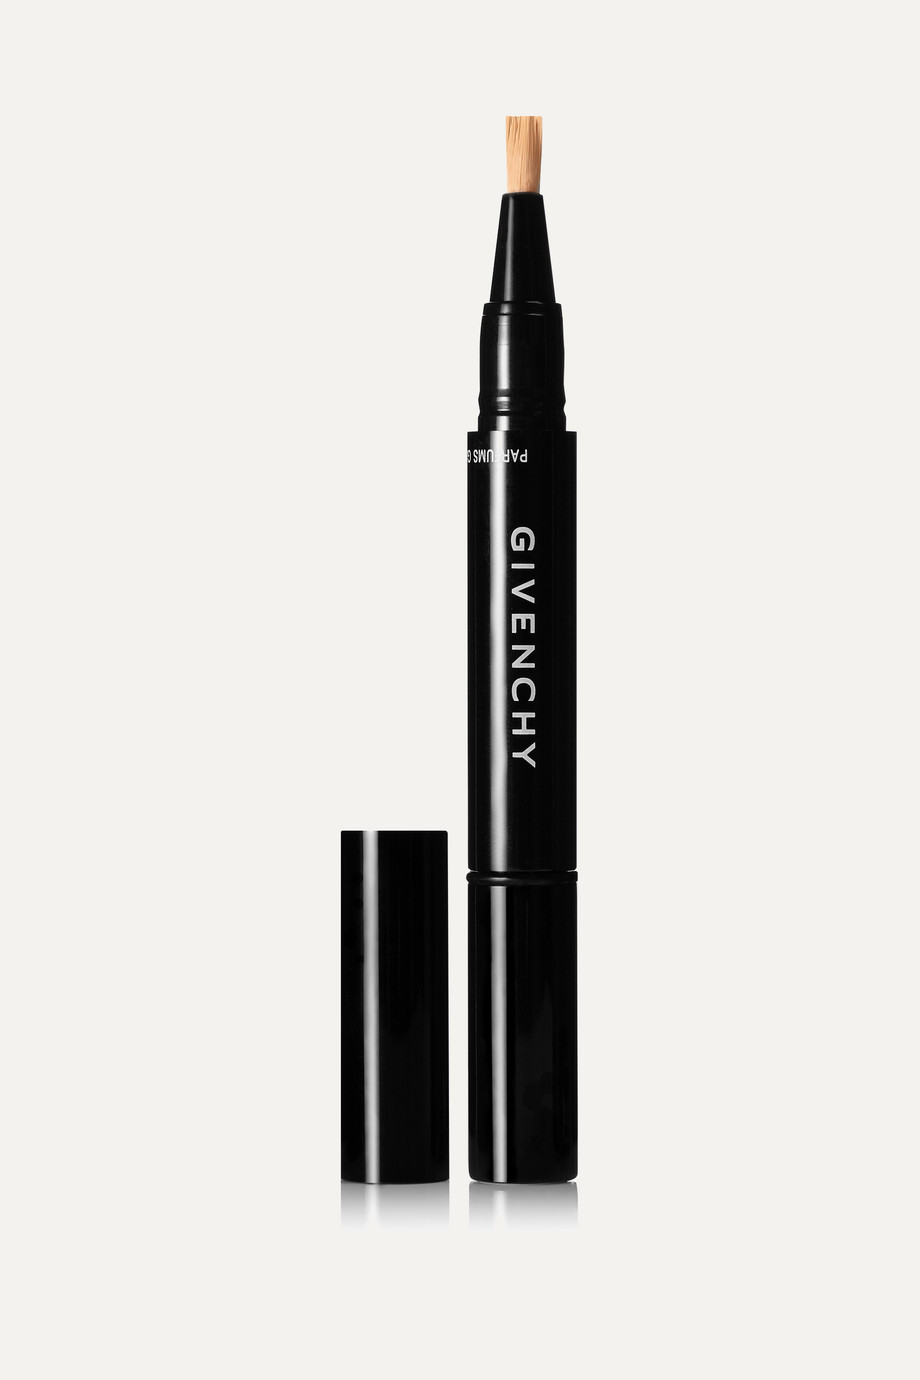 Givenchy Beauty Mister Instant Corrective Pen - Sand 130